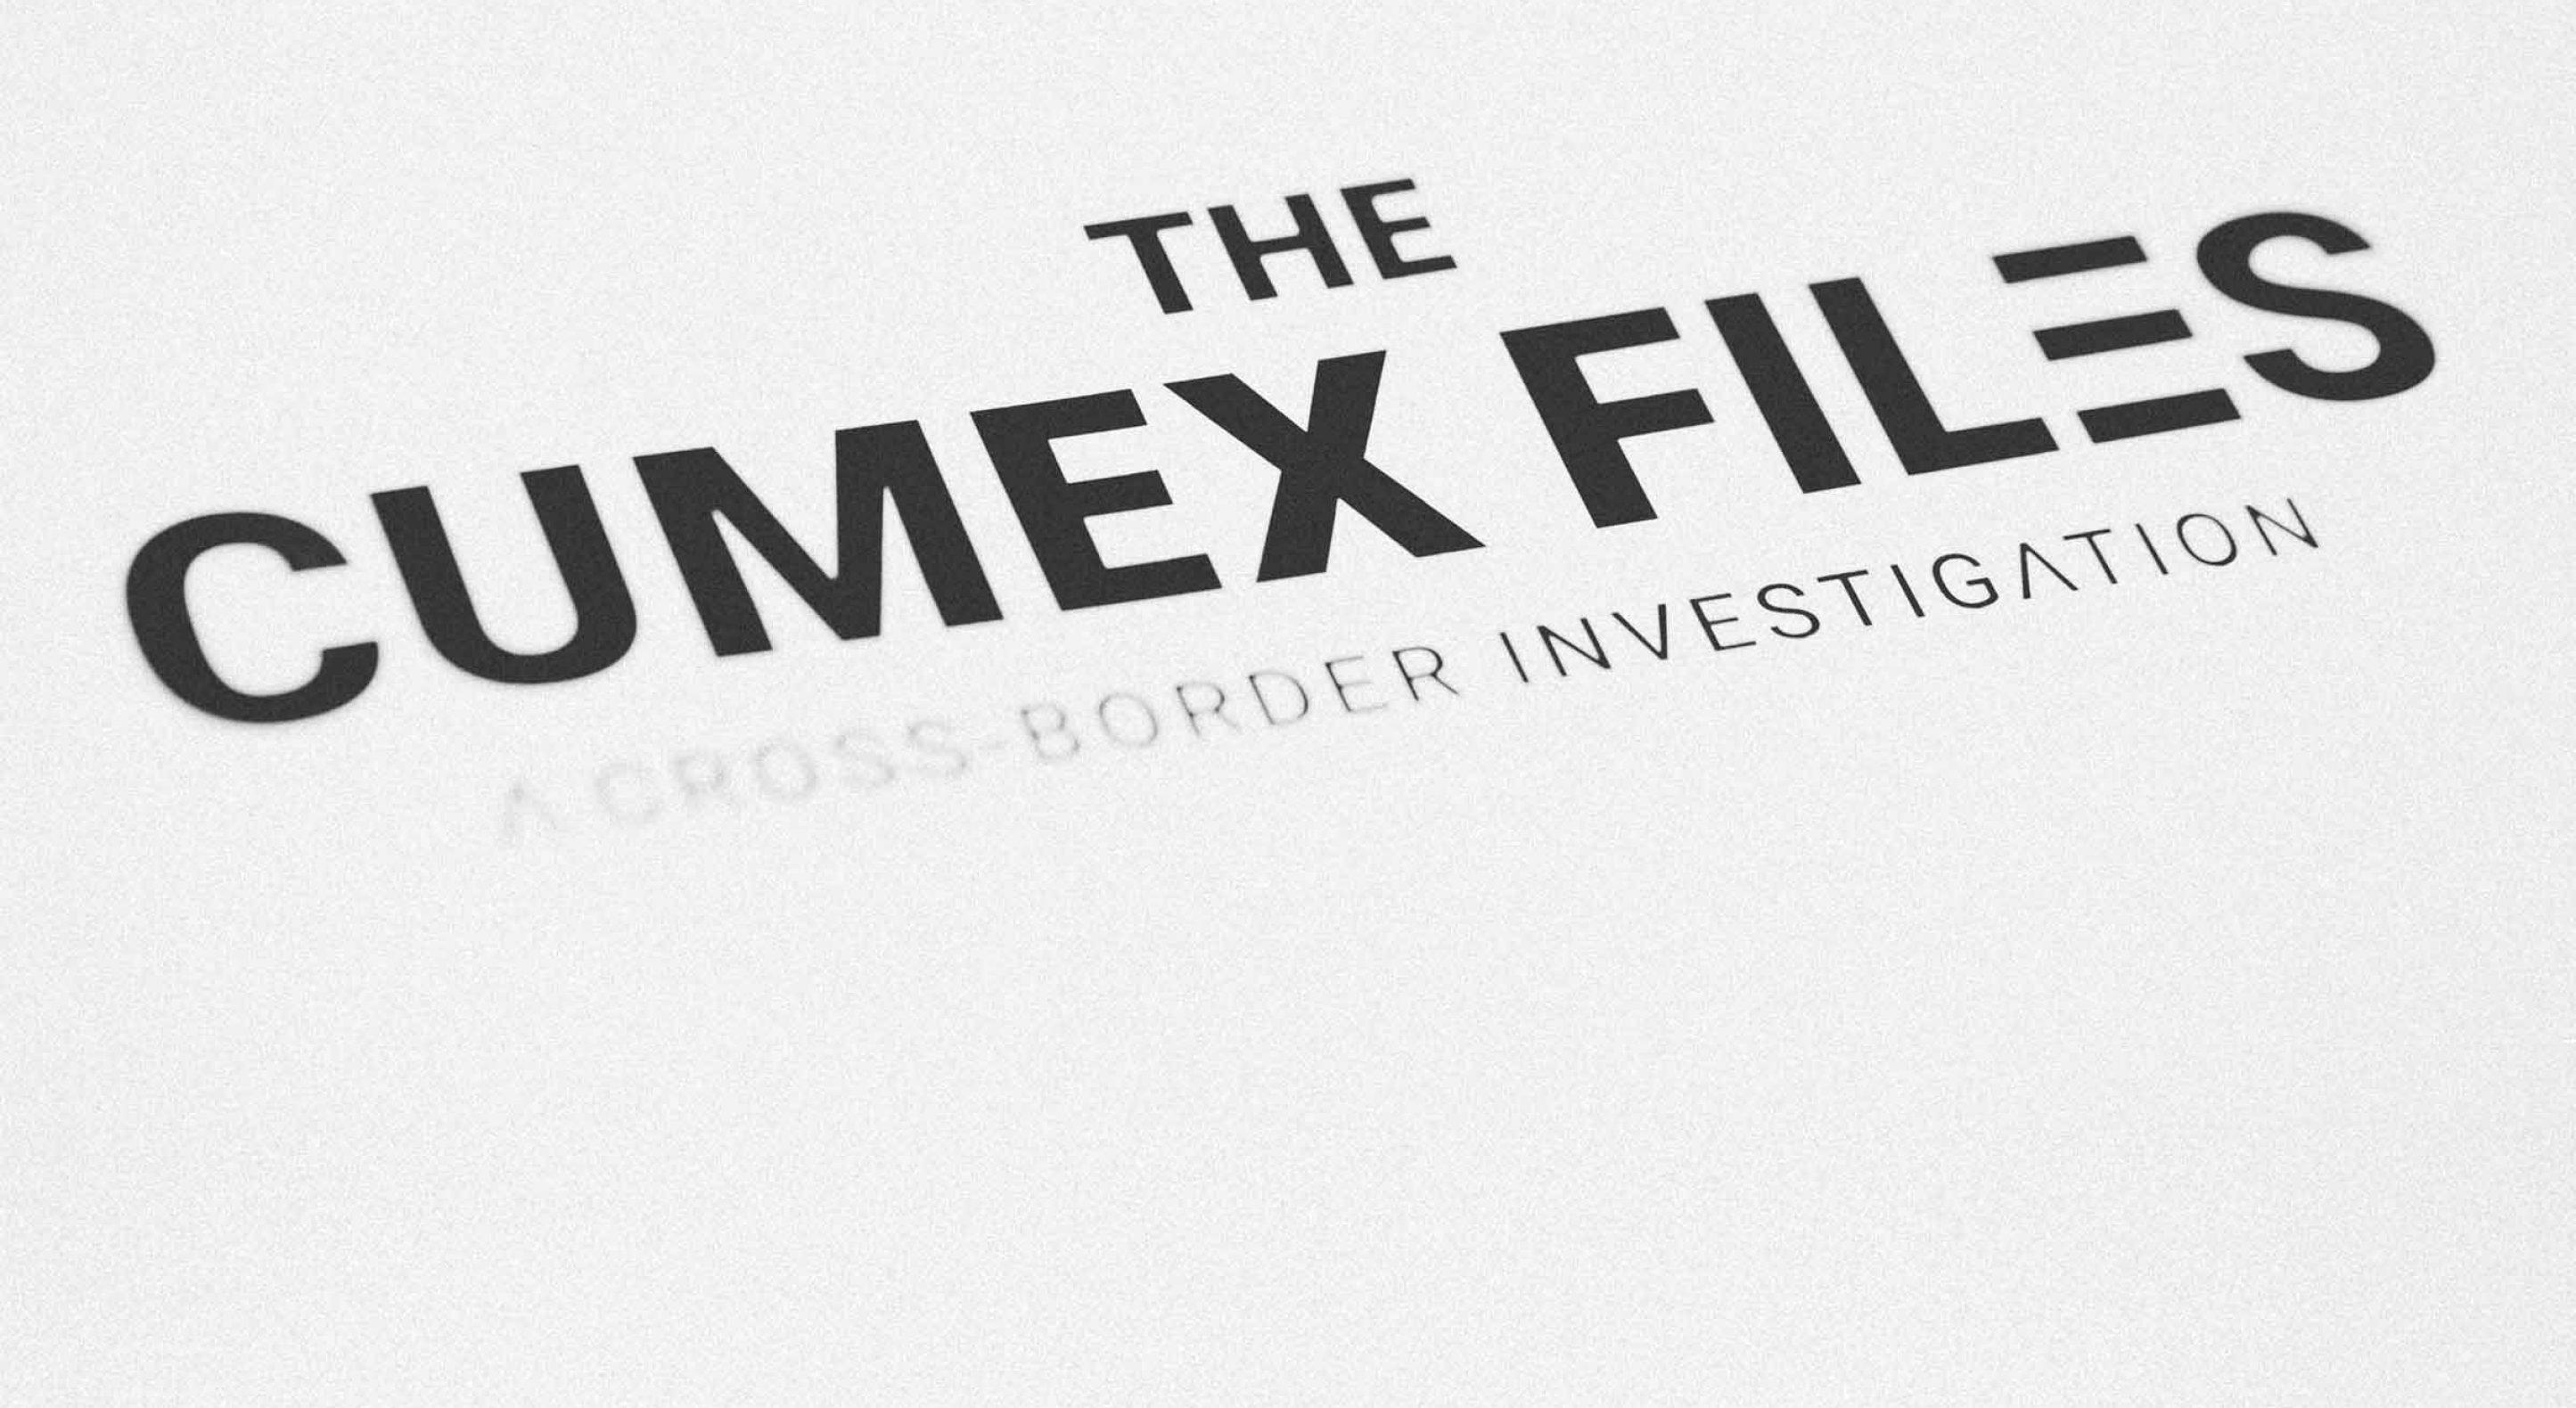 The CumEx Files